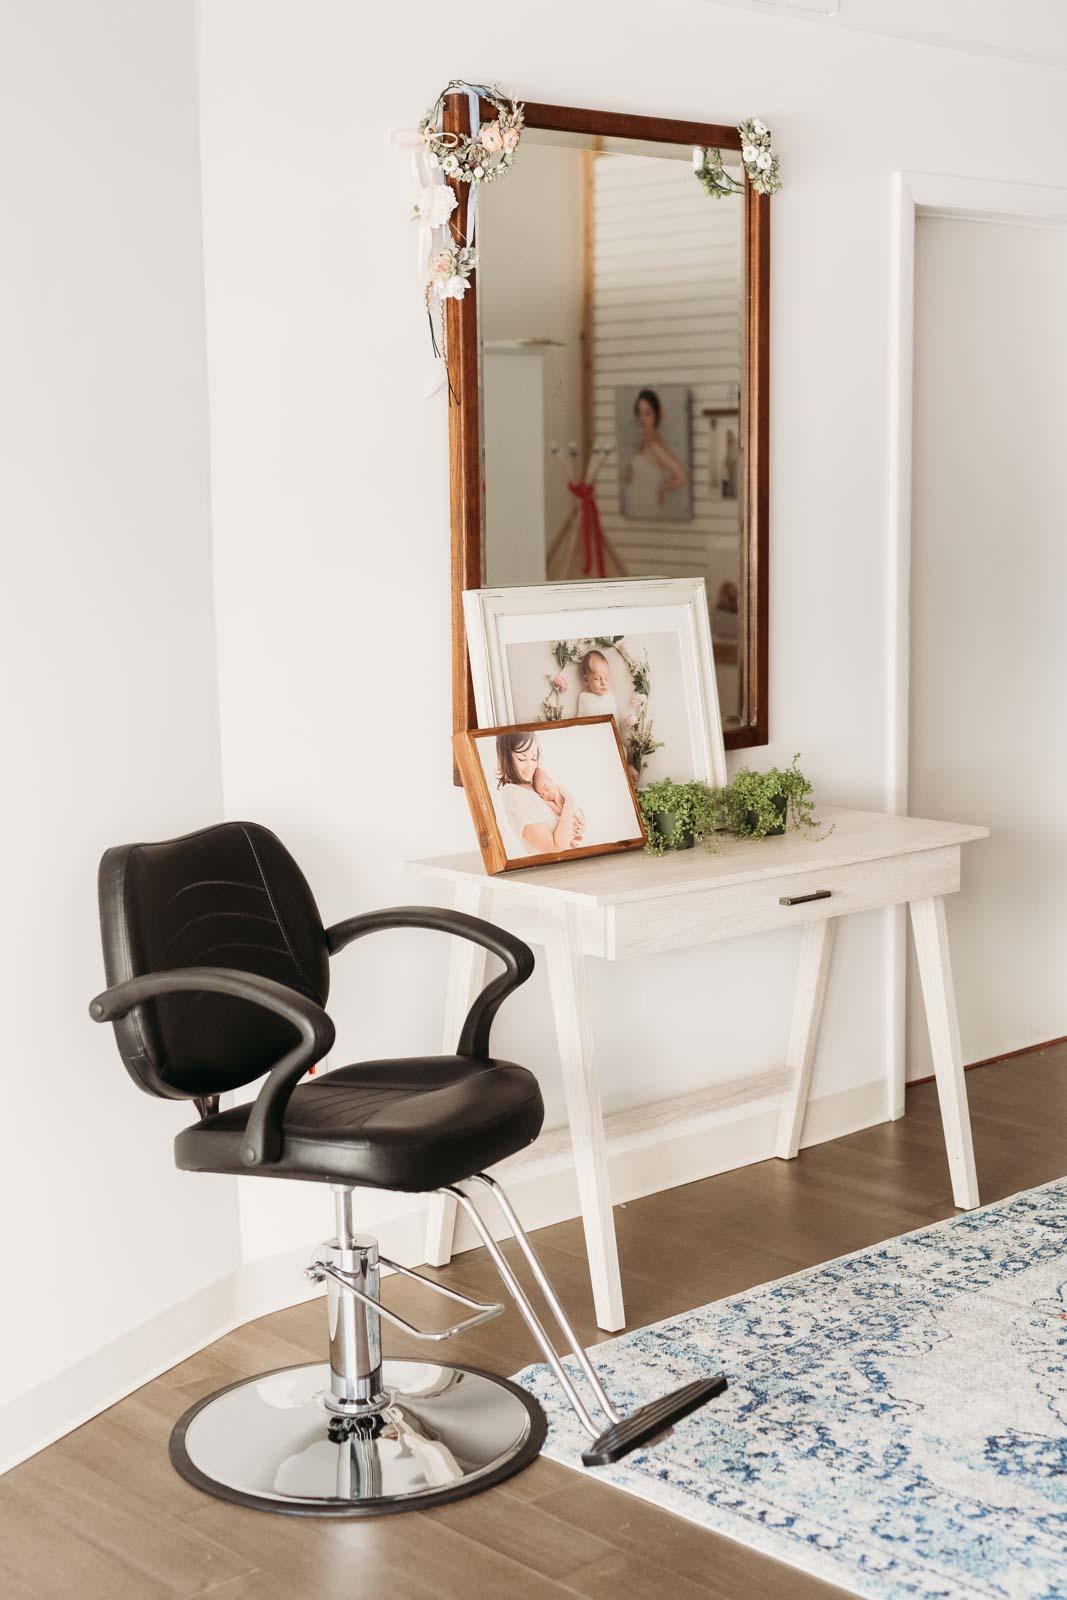 Client makeup area - after renovation